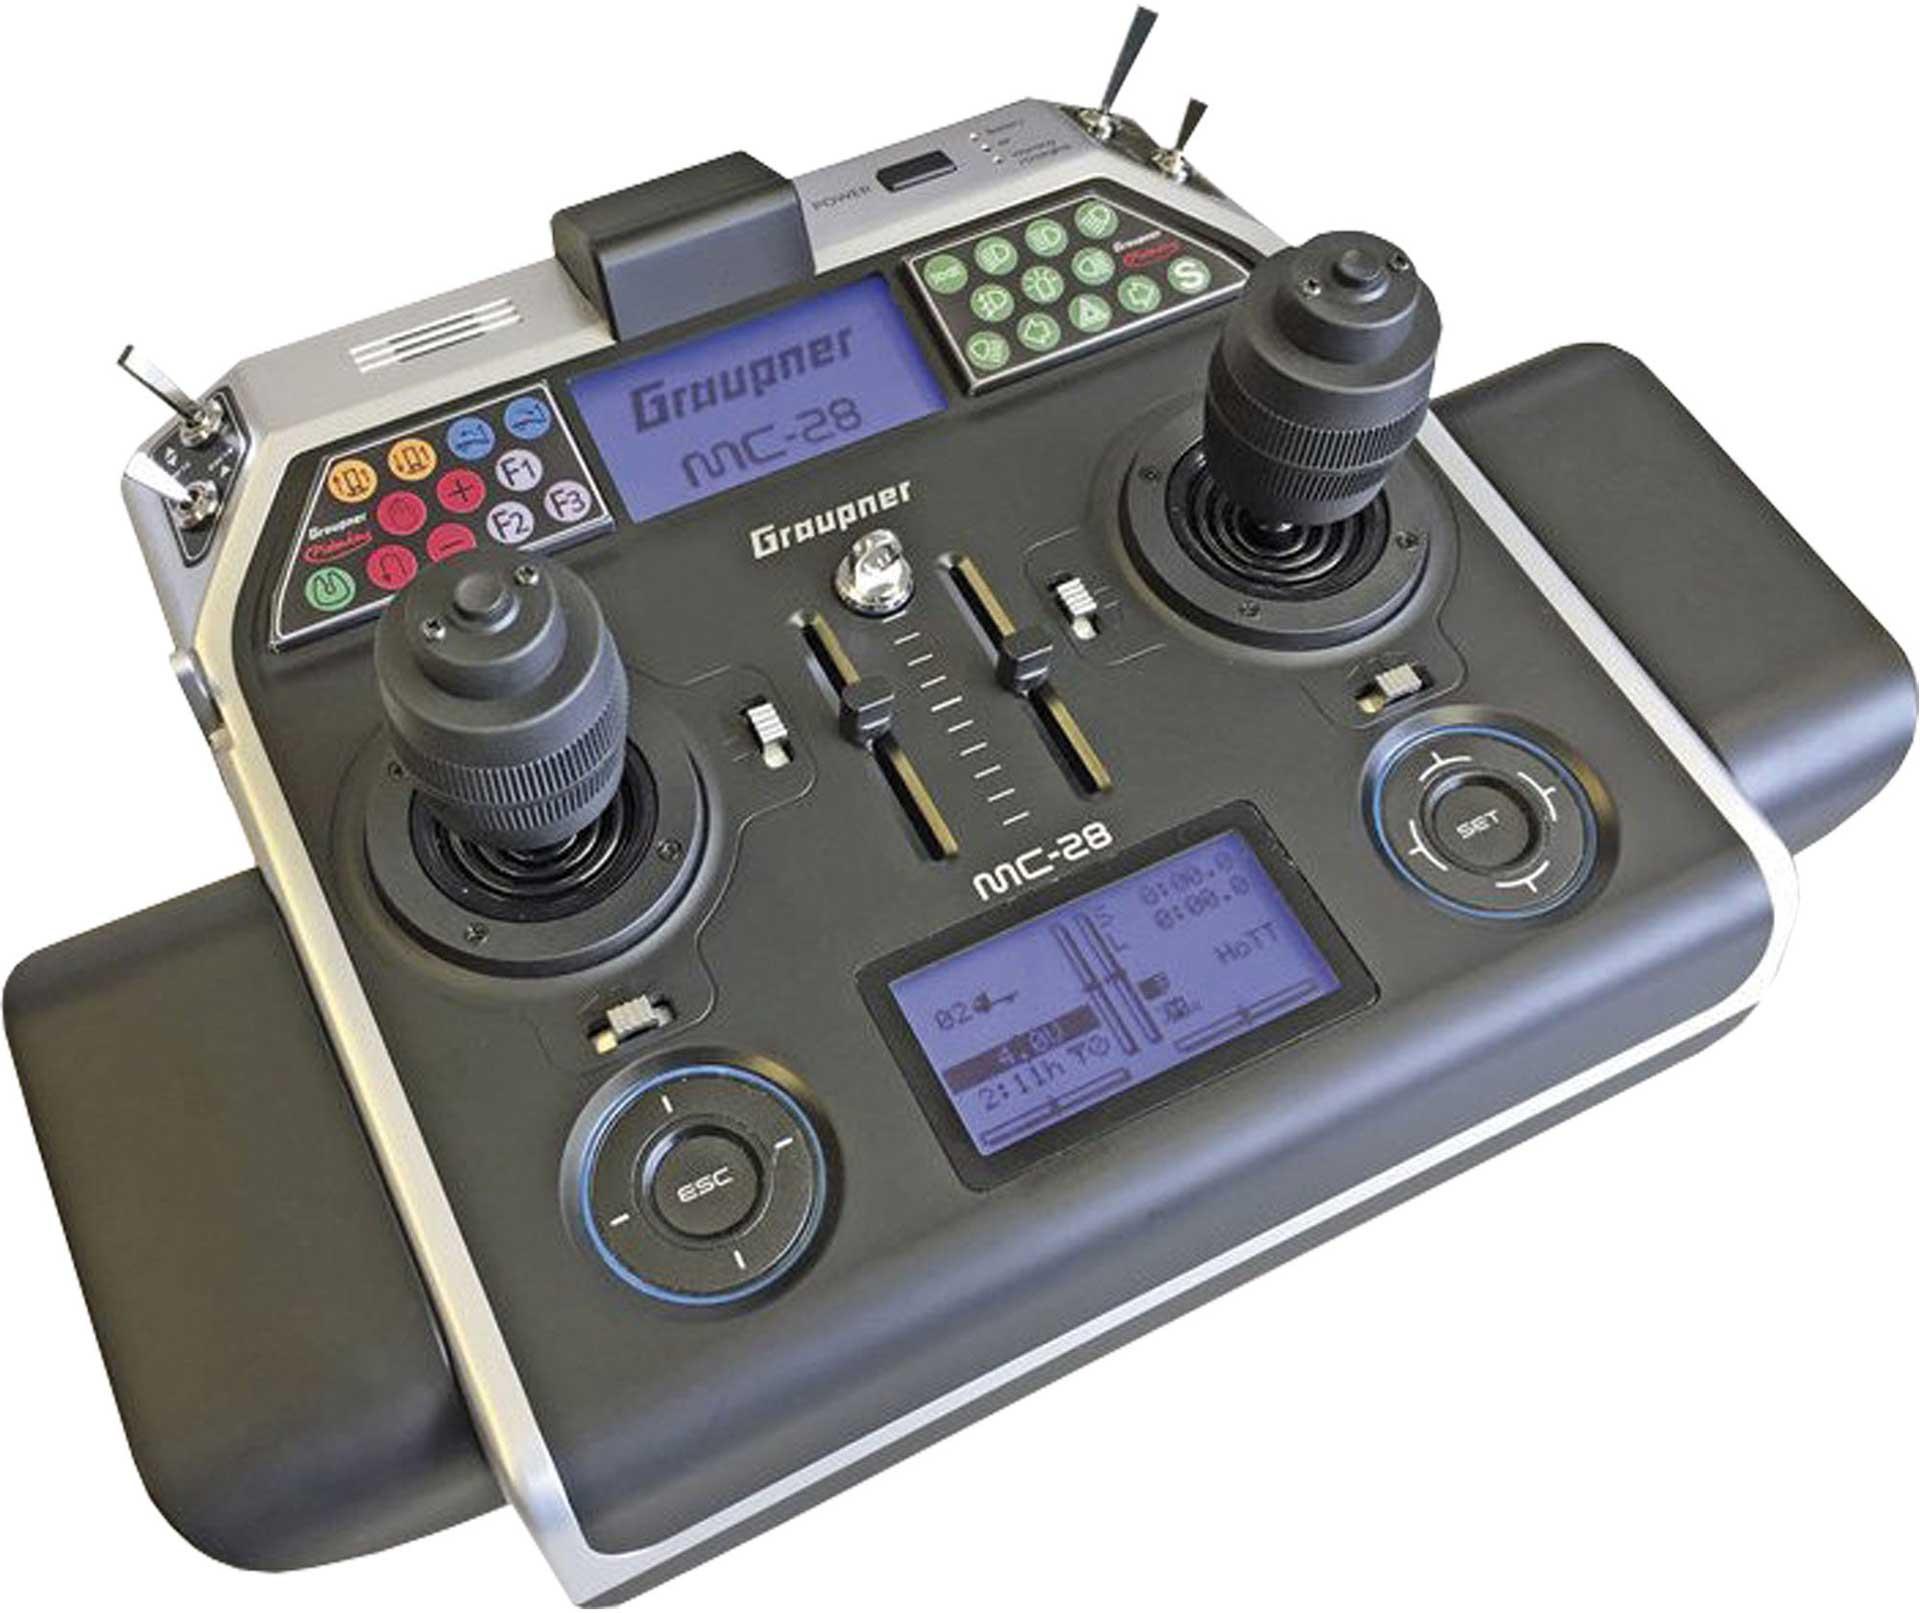 GRAUPNER MC-28 HOTT WITH 4D JOYSTICK SOLO REMOTE CONTROL